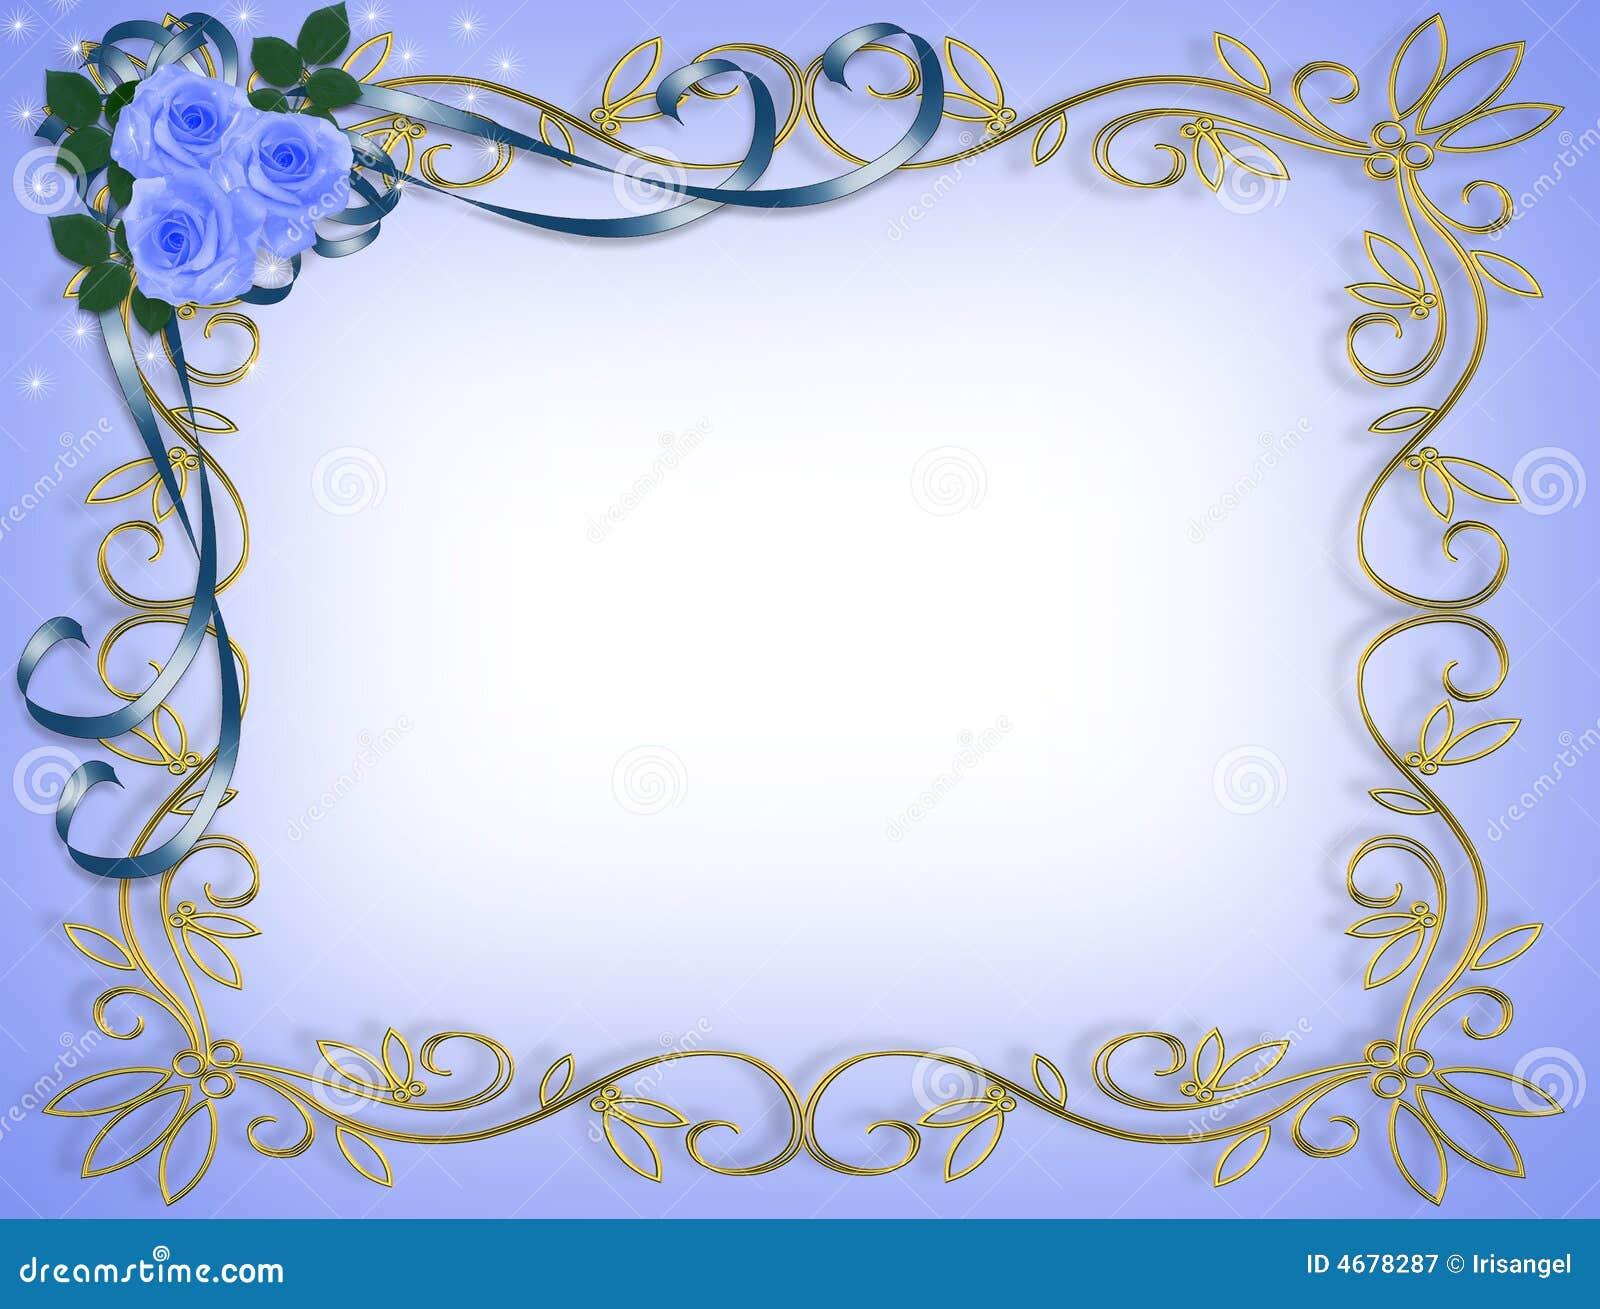 Blue Wedding Invitation Background: Wedding Invitation Blue Roses Royalty Free Stock